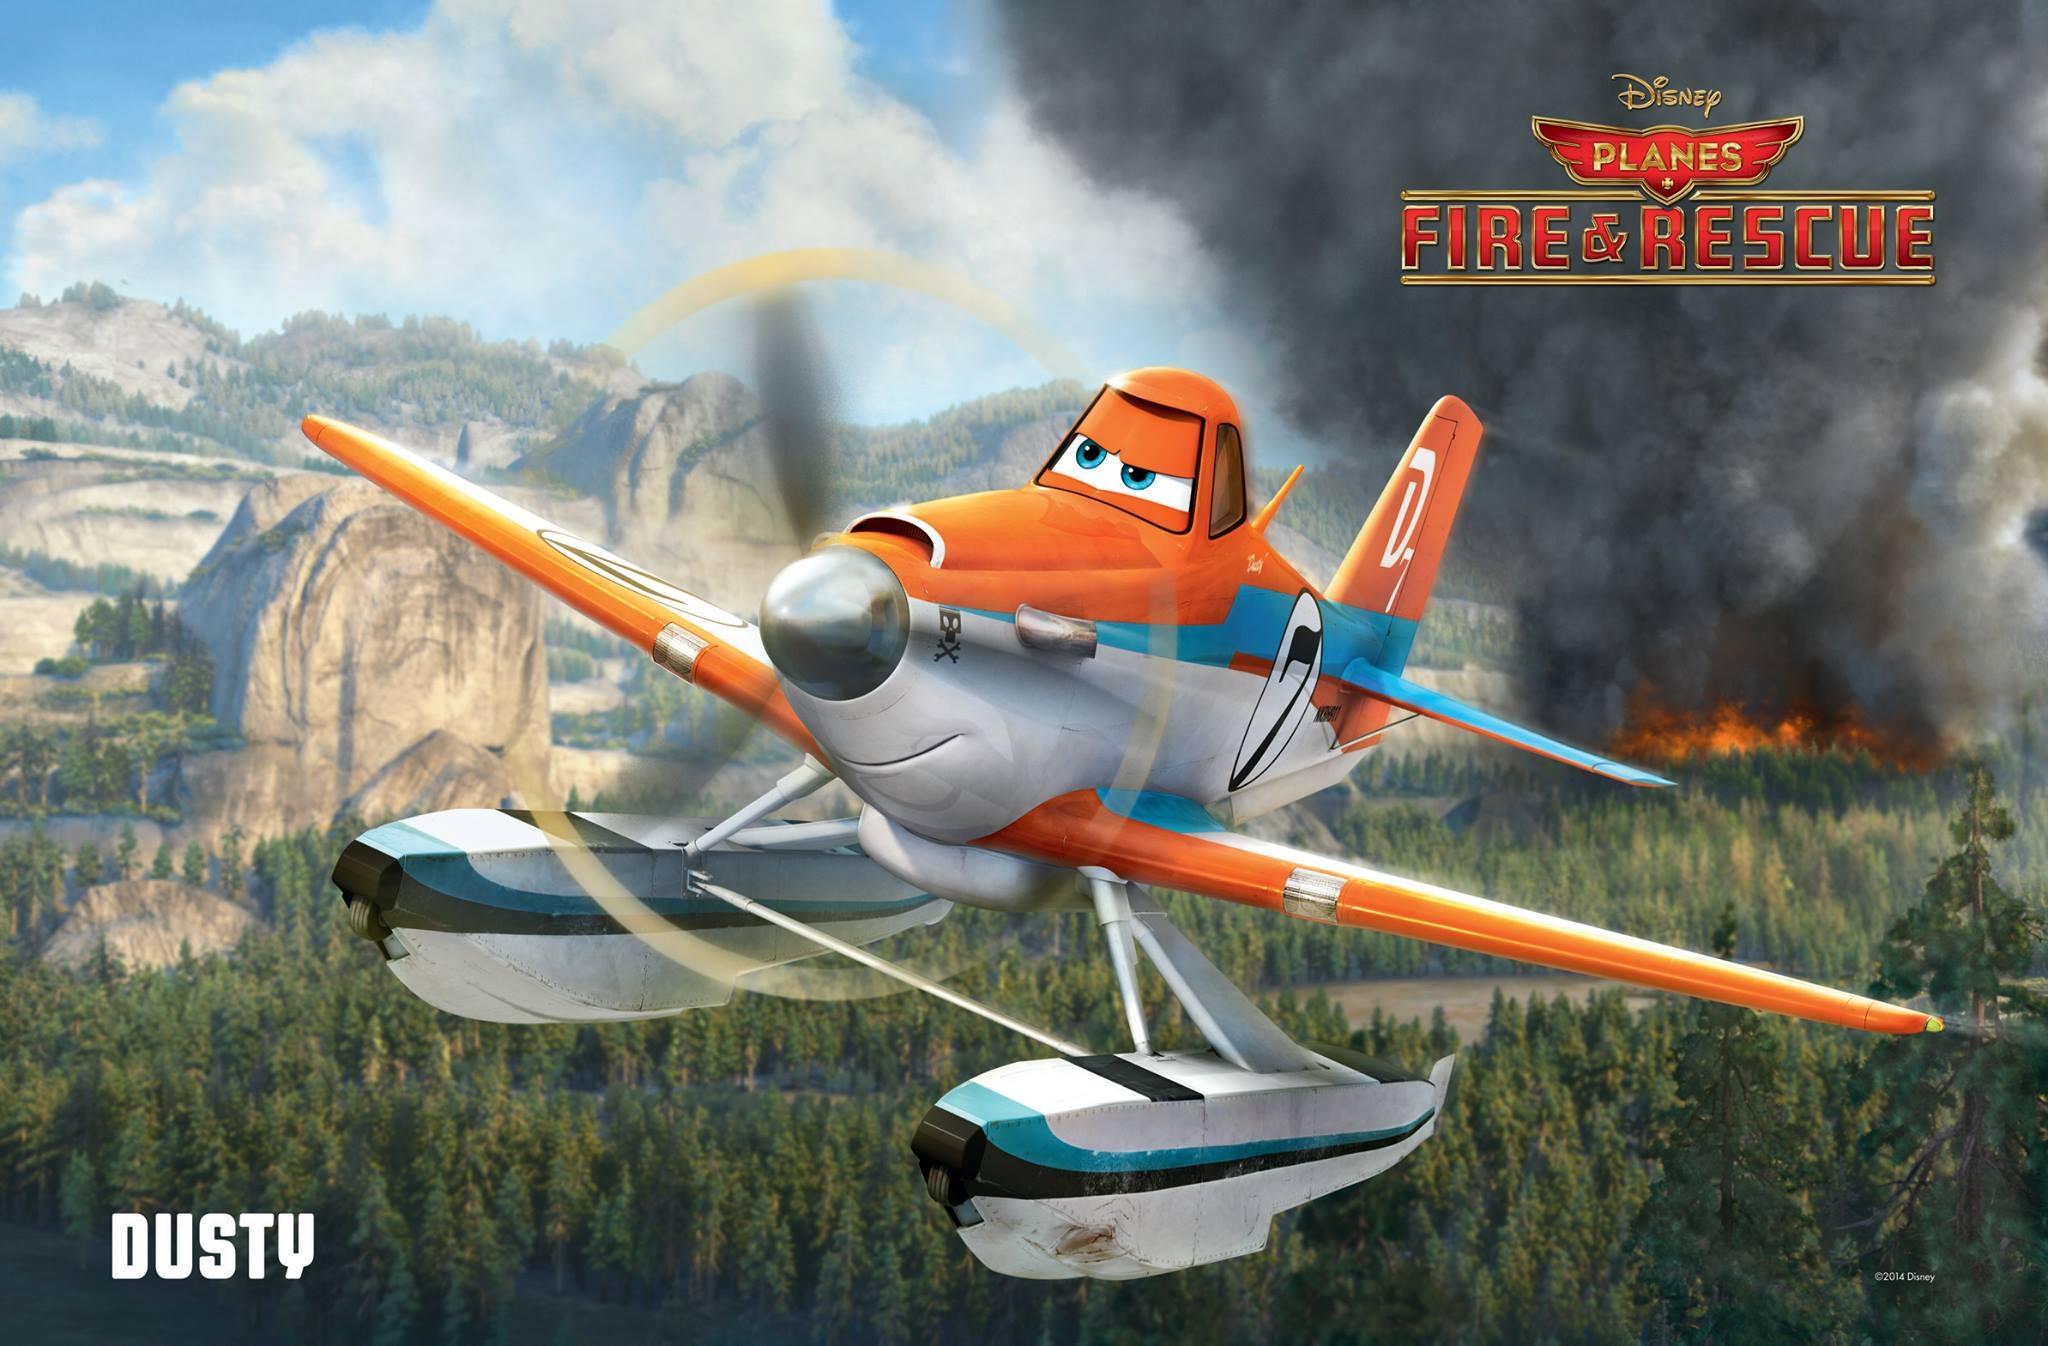 Pixar Disney Dusty planes2  mission canadair